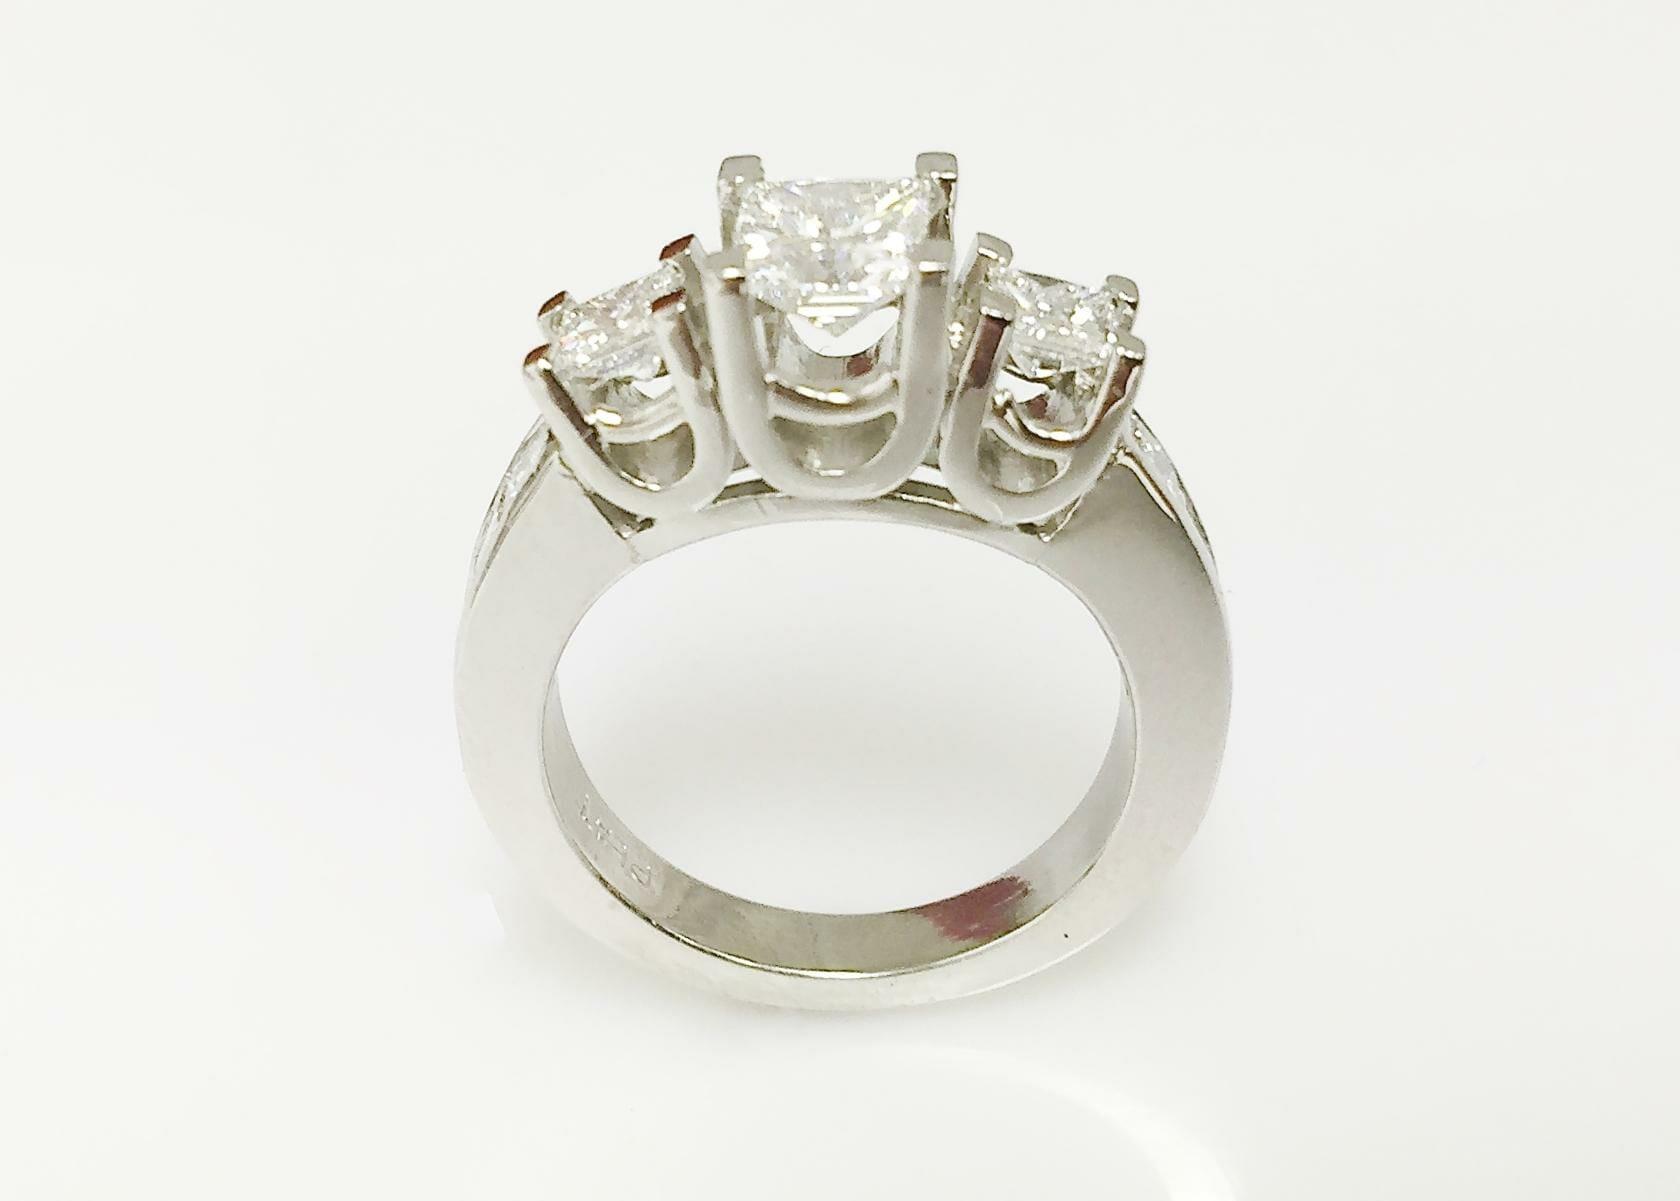 Mary Platinum Three Stone Ring Keezing Kreations